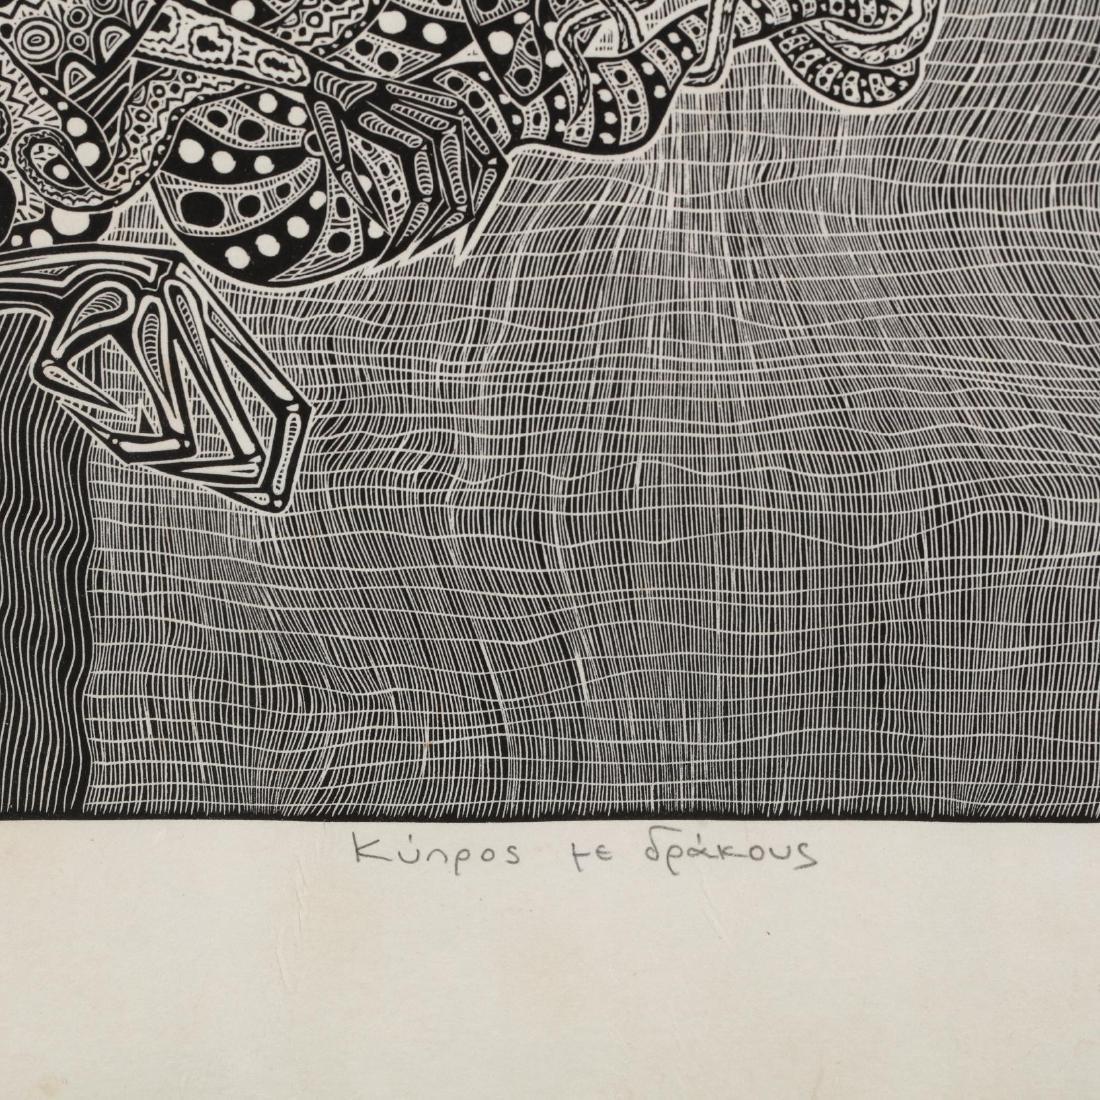 Hambis Tsangaris (Cypriot, b. 1947), Two Visions of - 7